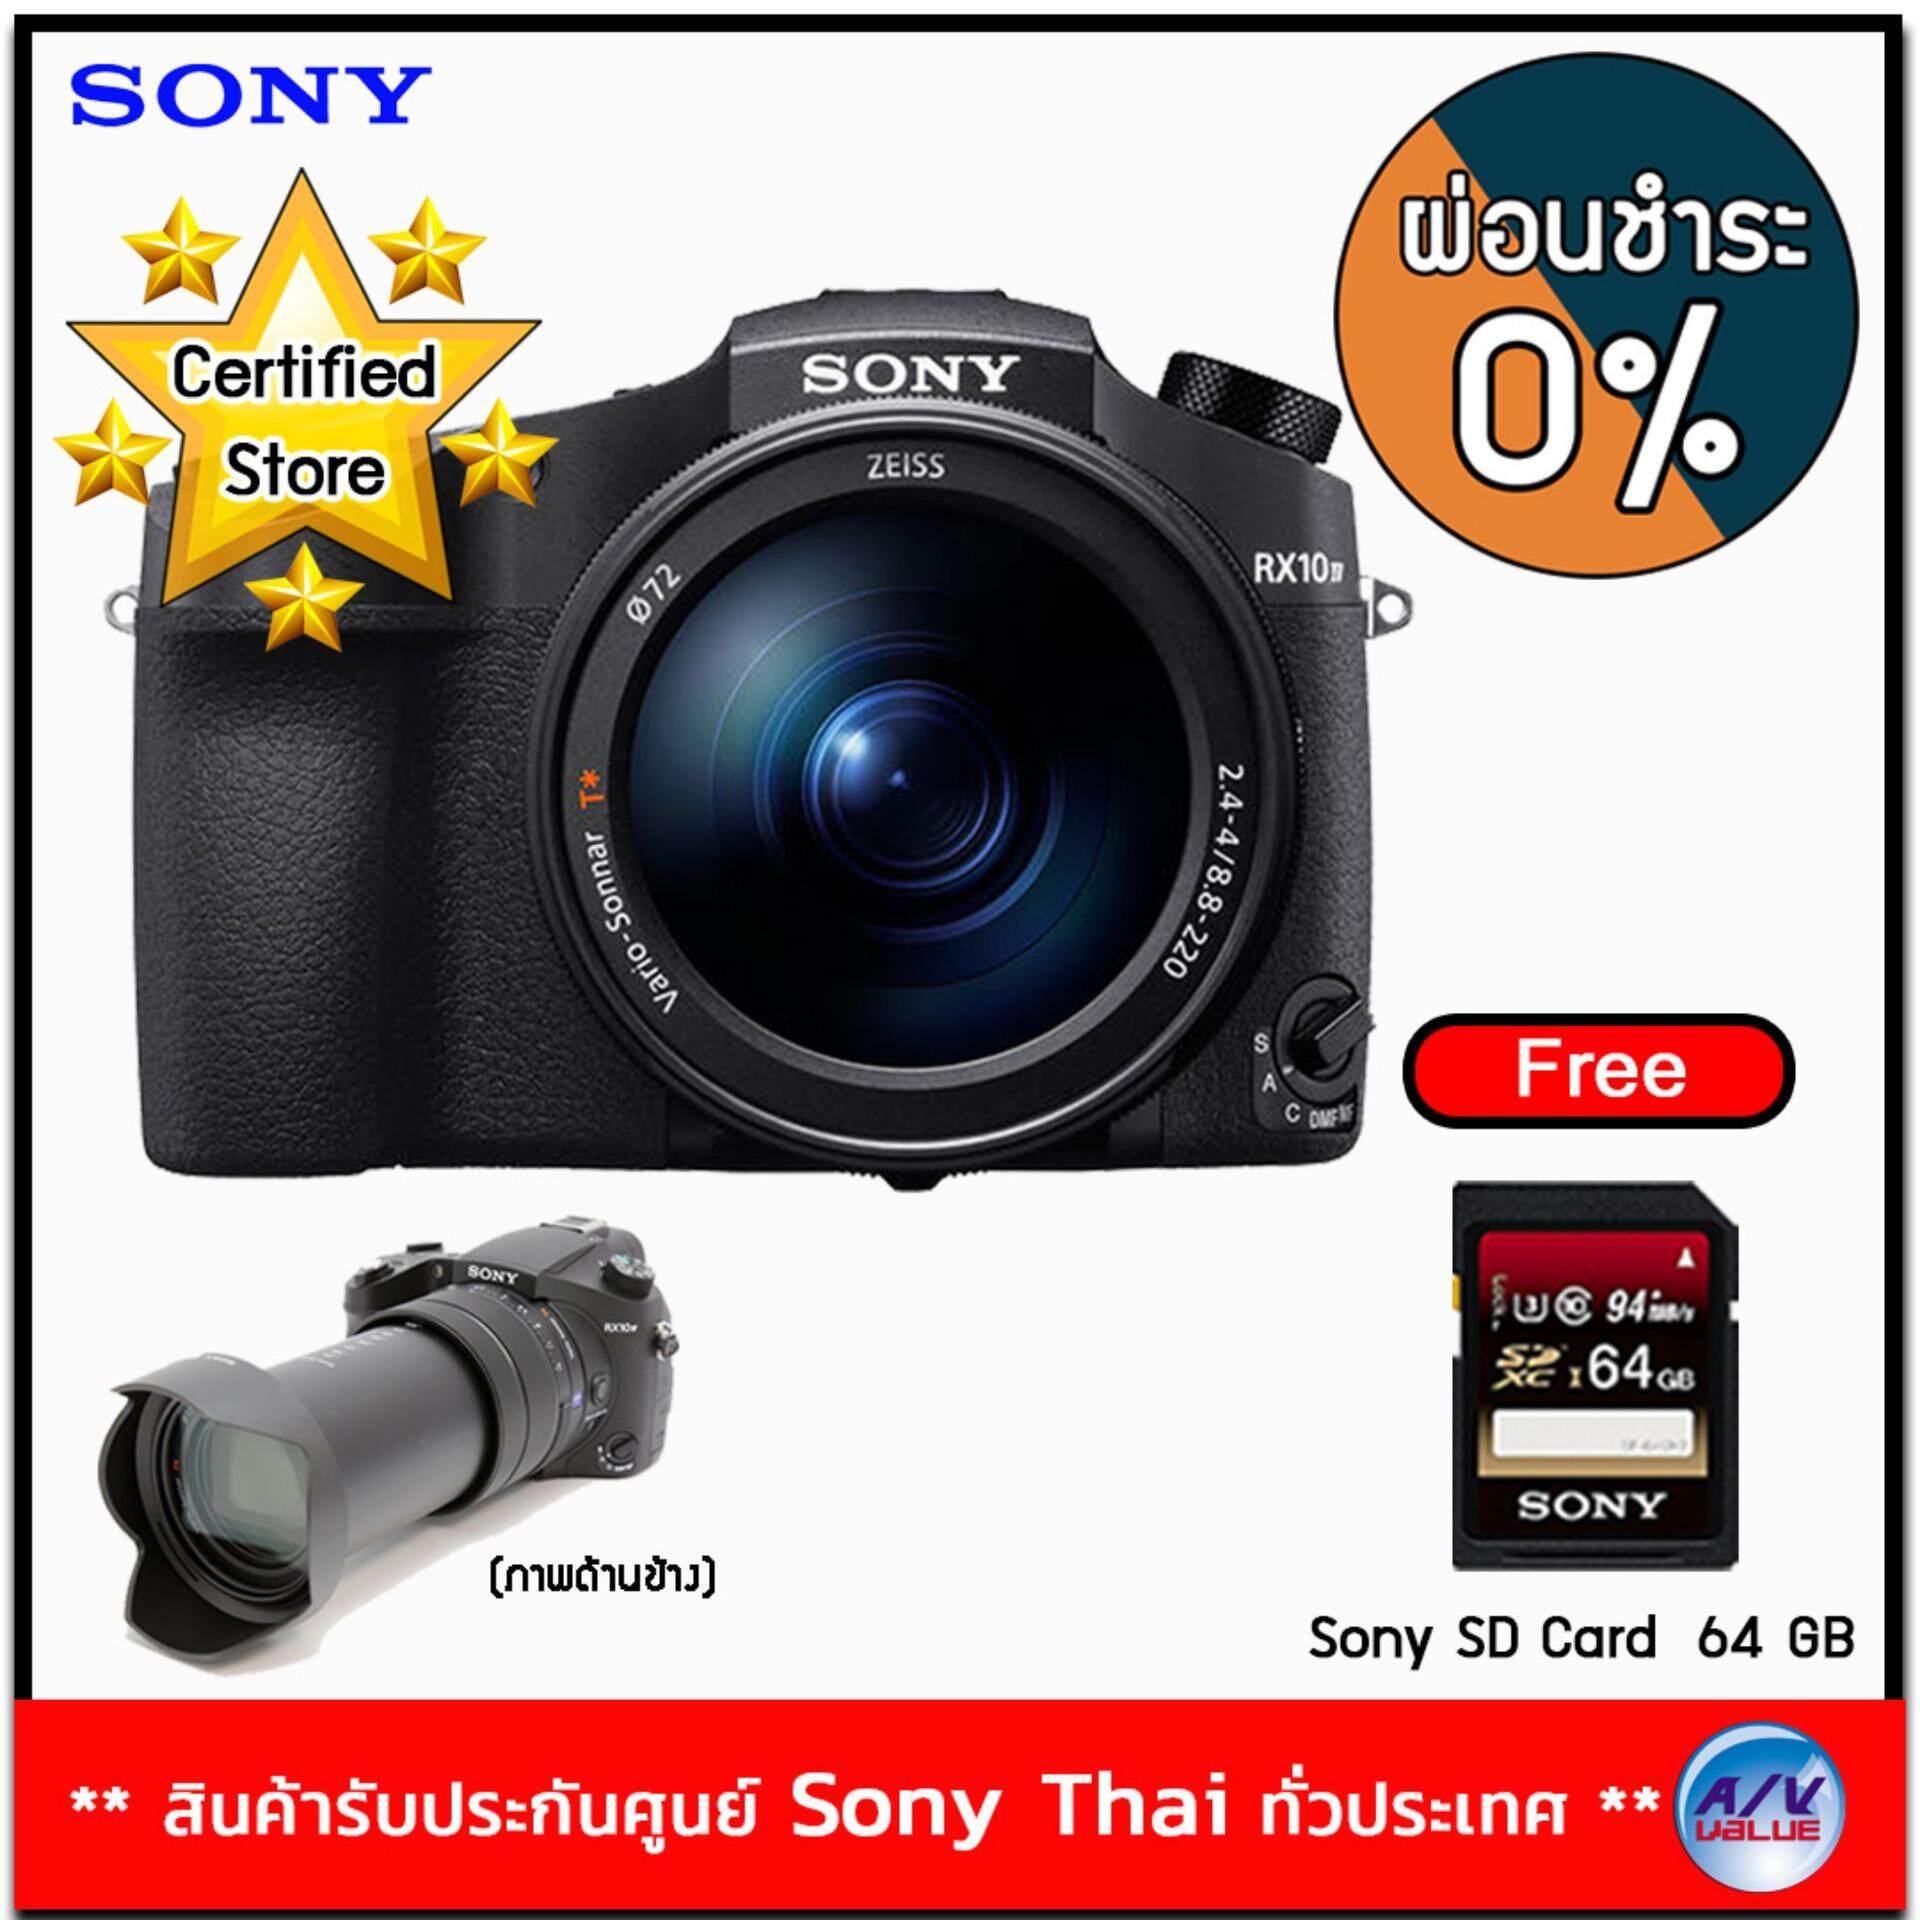 Sony Cyber-shot Pro รุ่น DSC-RX10M4 + Sony SD Card 64GB ***รับประกันศูนย์  Sony ทั่วประเทศ